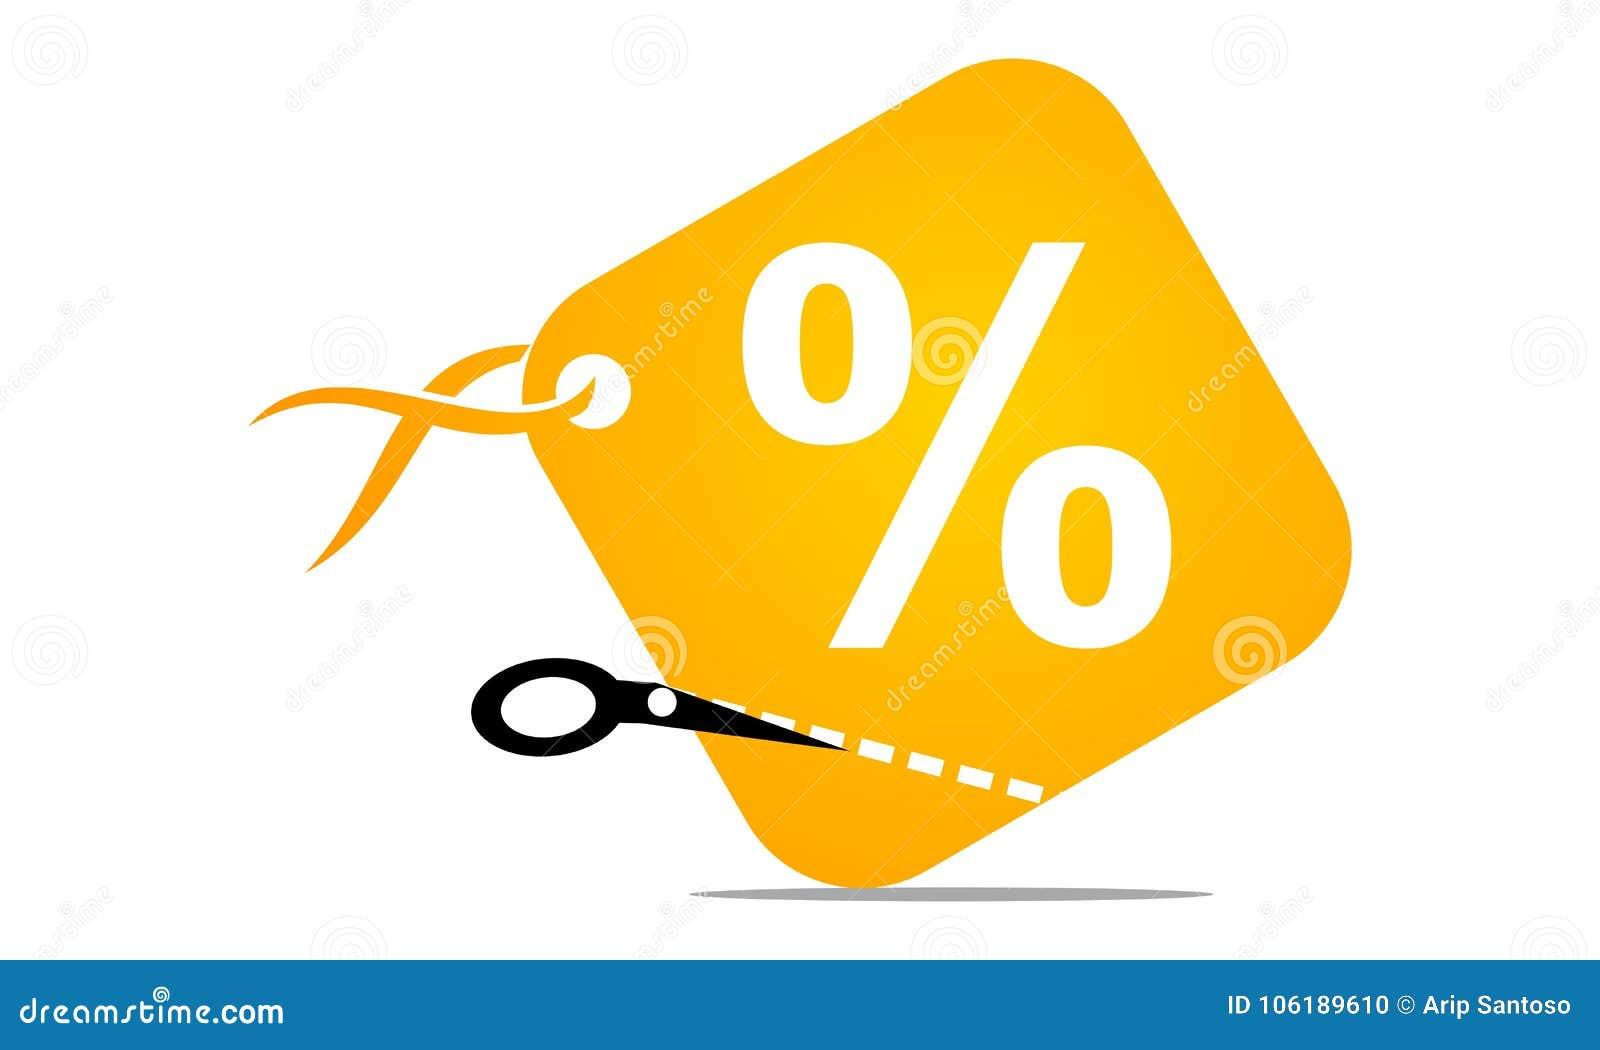 Discount Symbol Logo Design Template Stock Vector Illustration Of